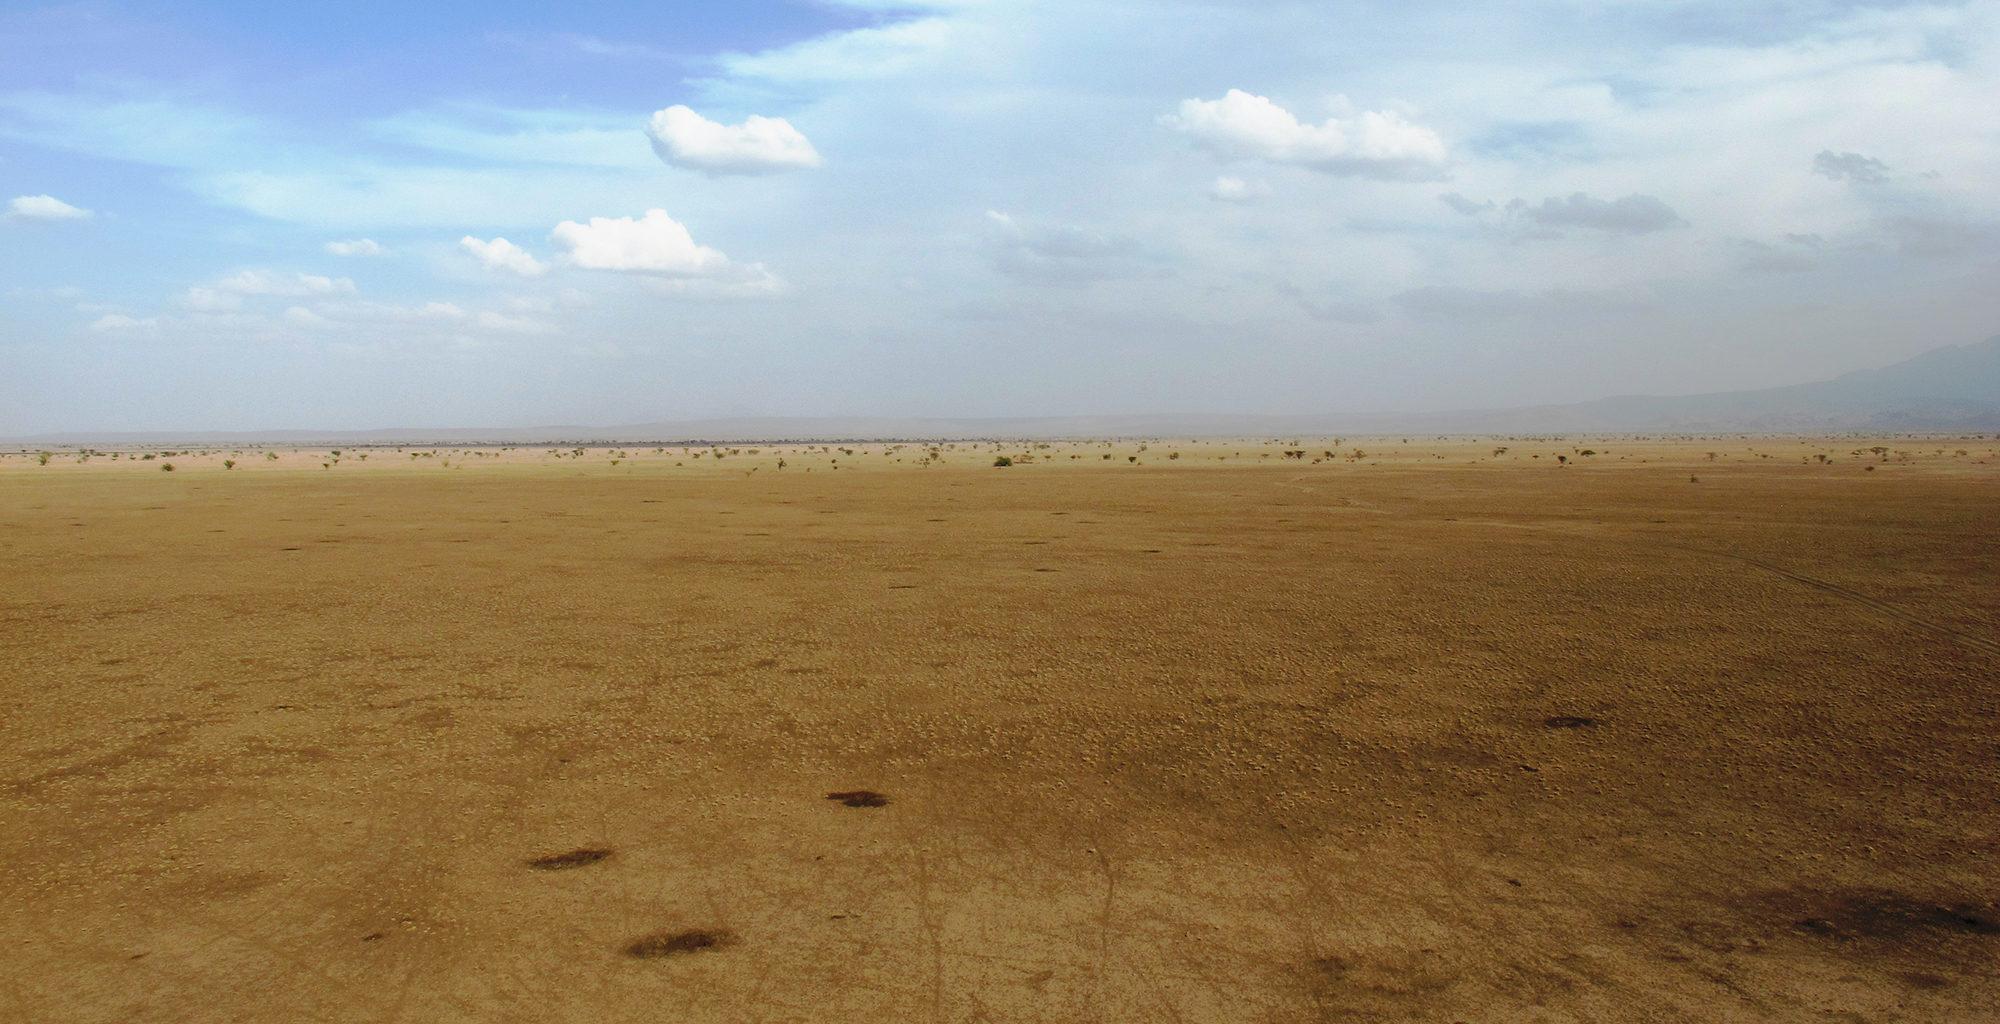 Ethiopia-Awash-Alledeghi-Landscape